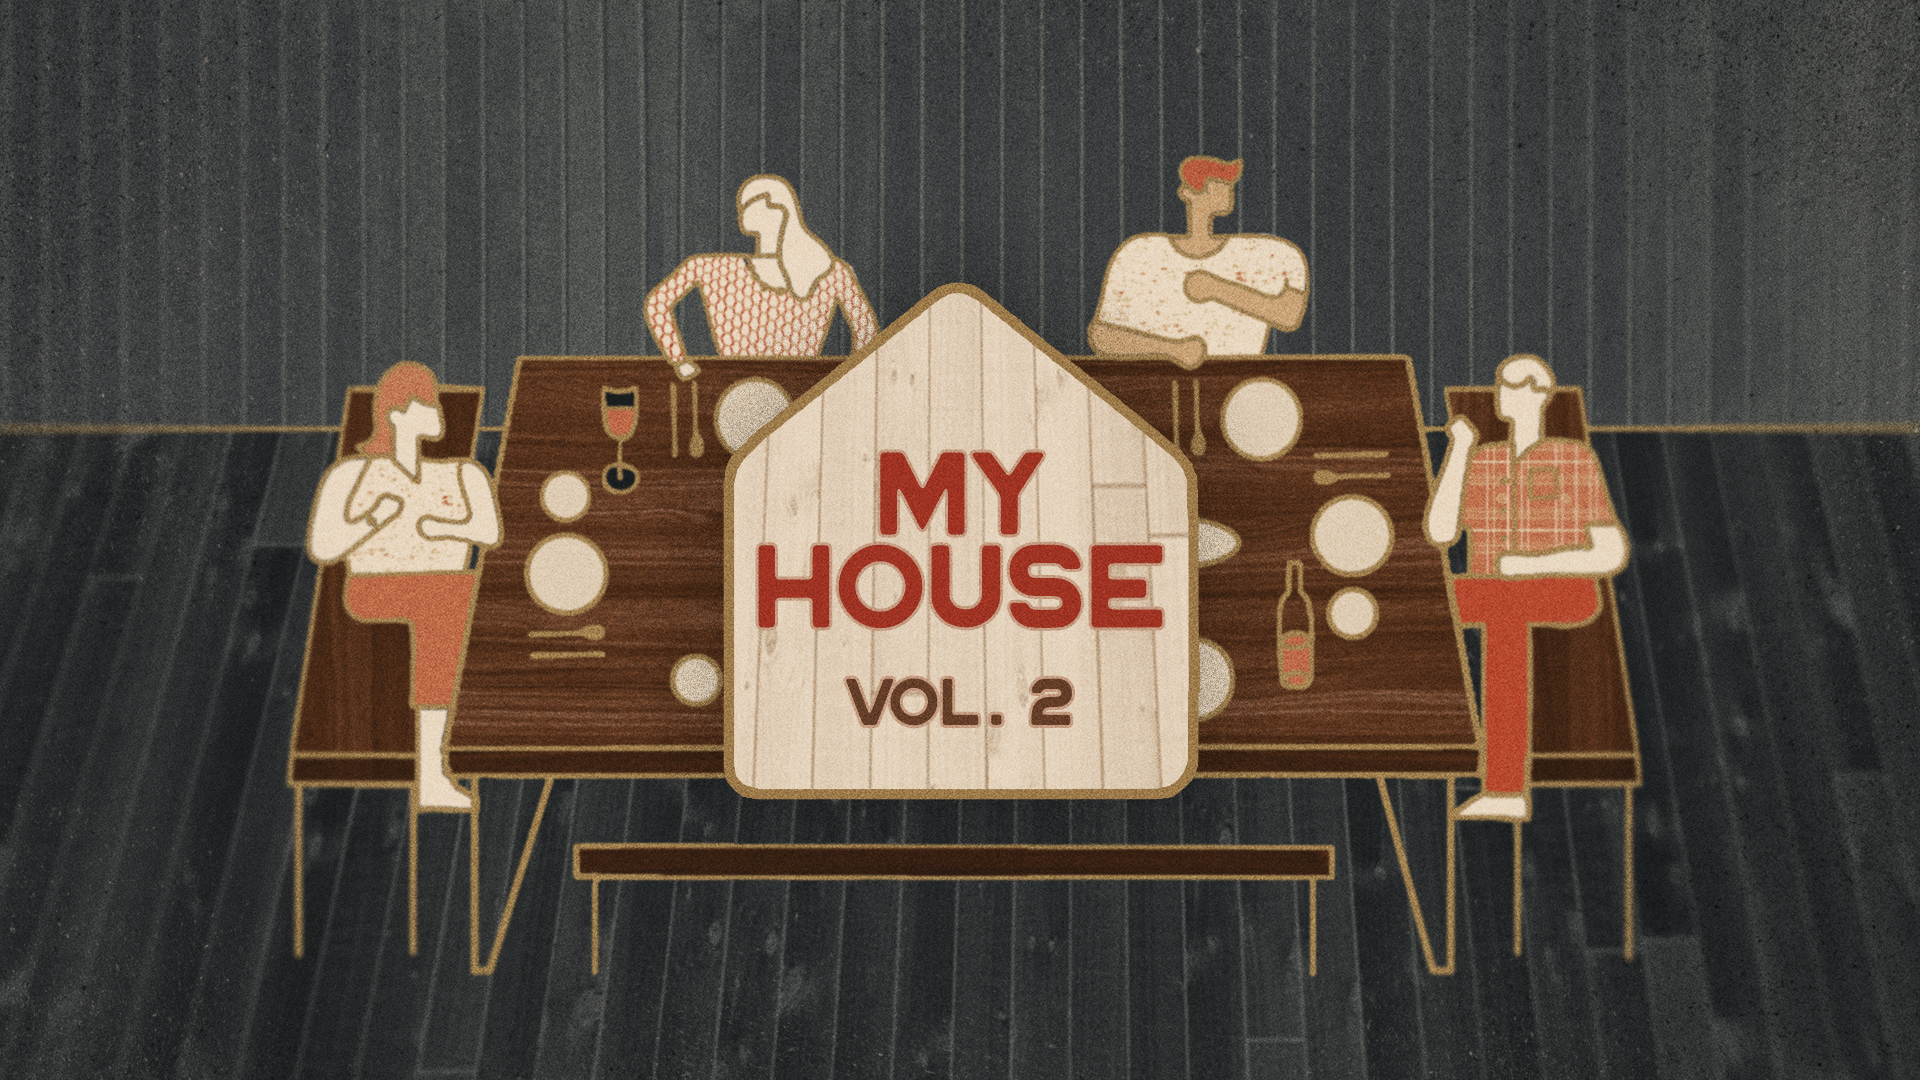 My House vol. 2